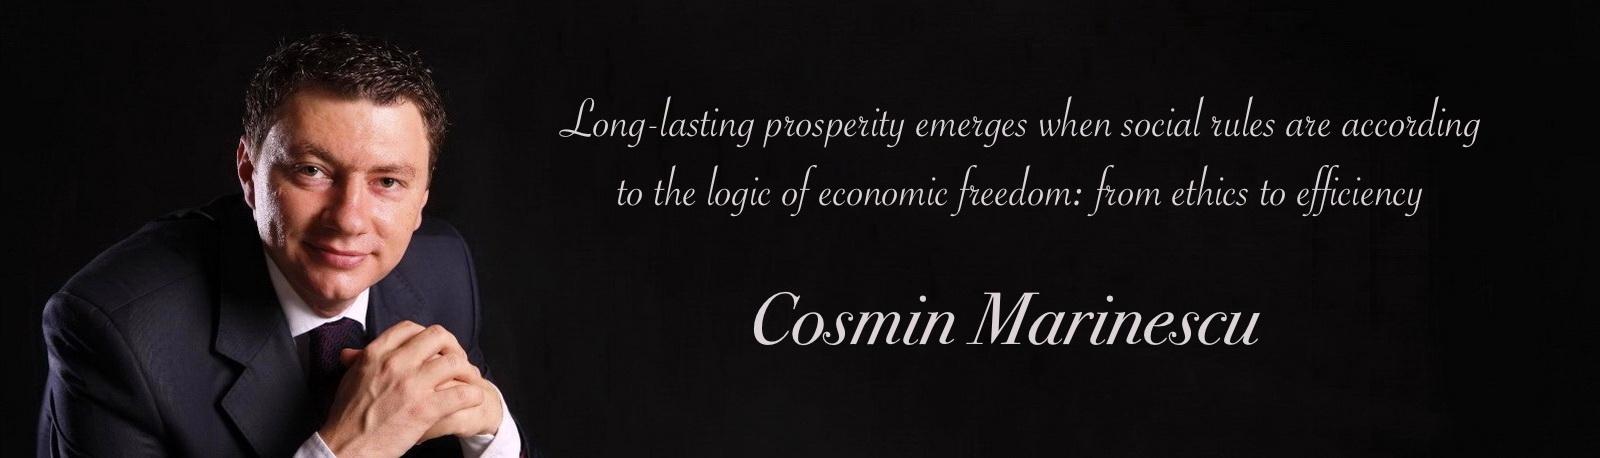 http://en.cosmin-marinescu.ro/wp-content/uploads/2017/10/Slide-2-EN.jpeg